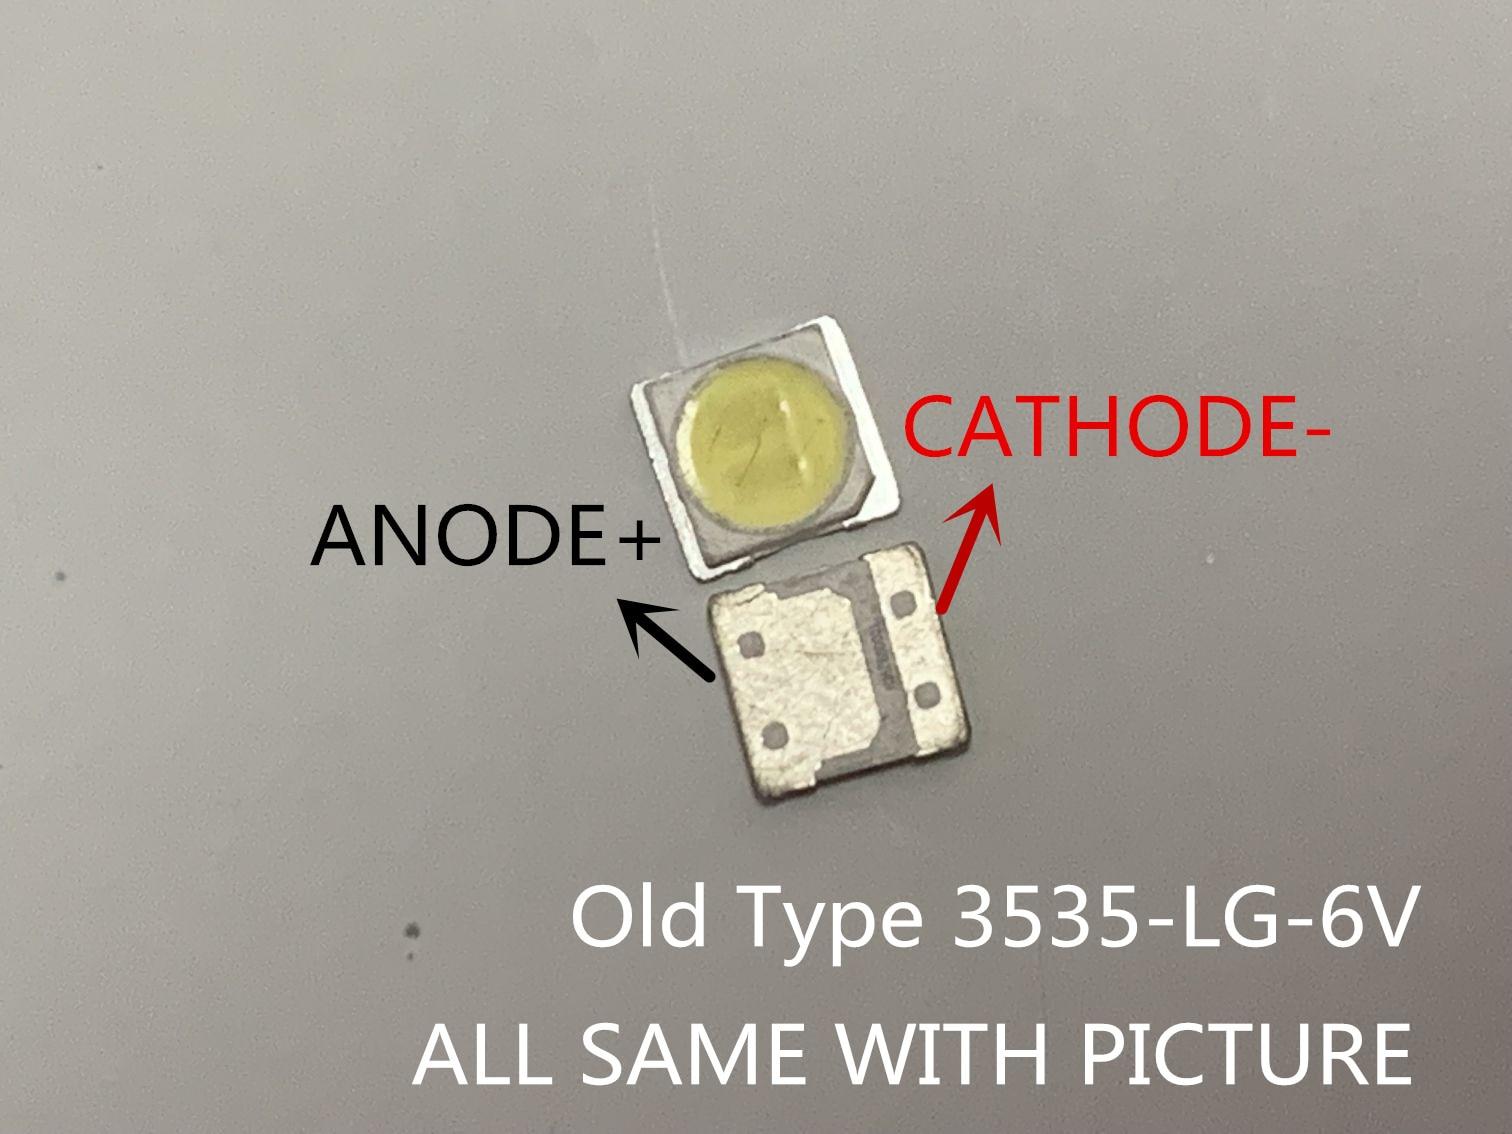 Para LG SMD LED tipo antiguo LG led 10 Uds 3535 6V CHIP blanco frío-2 2W para TV/retroiluminación LCD aplicación de TV original 3535 6v